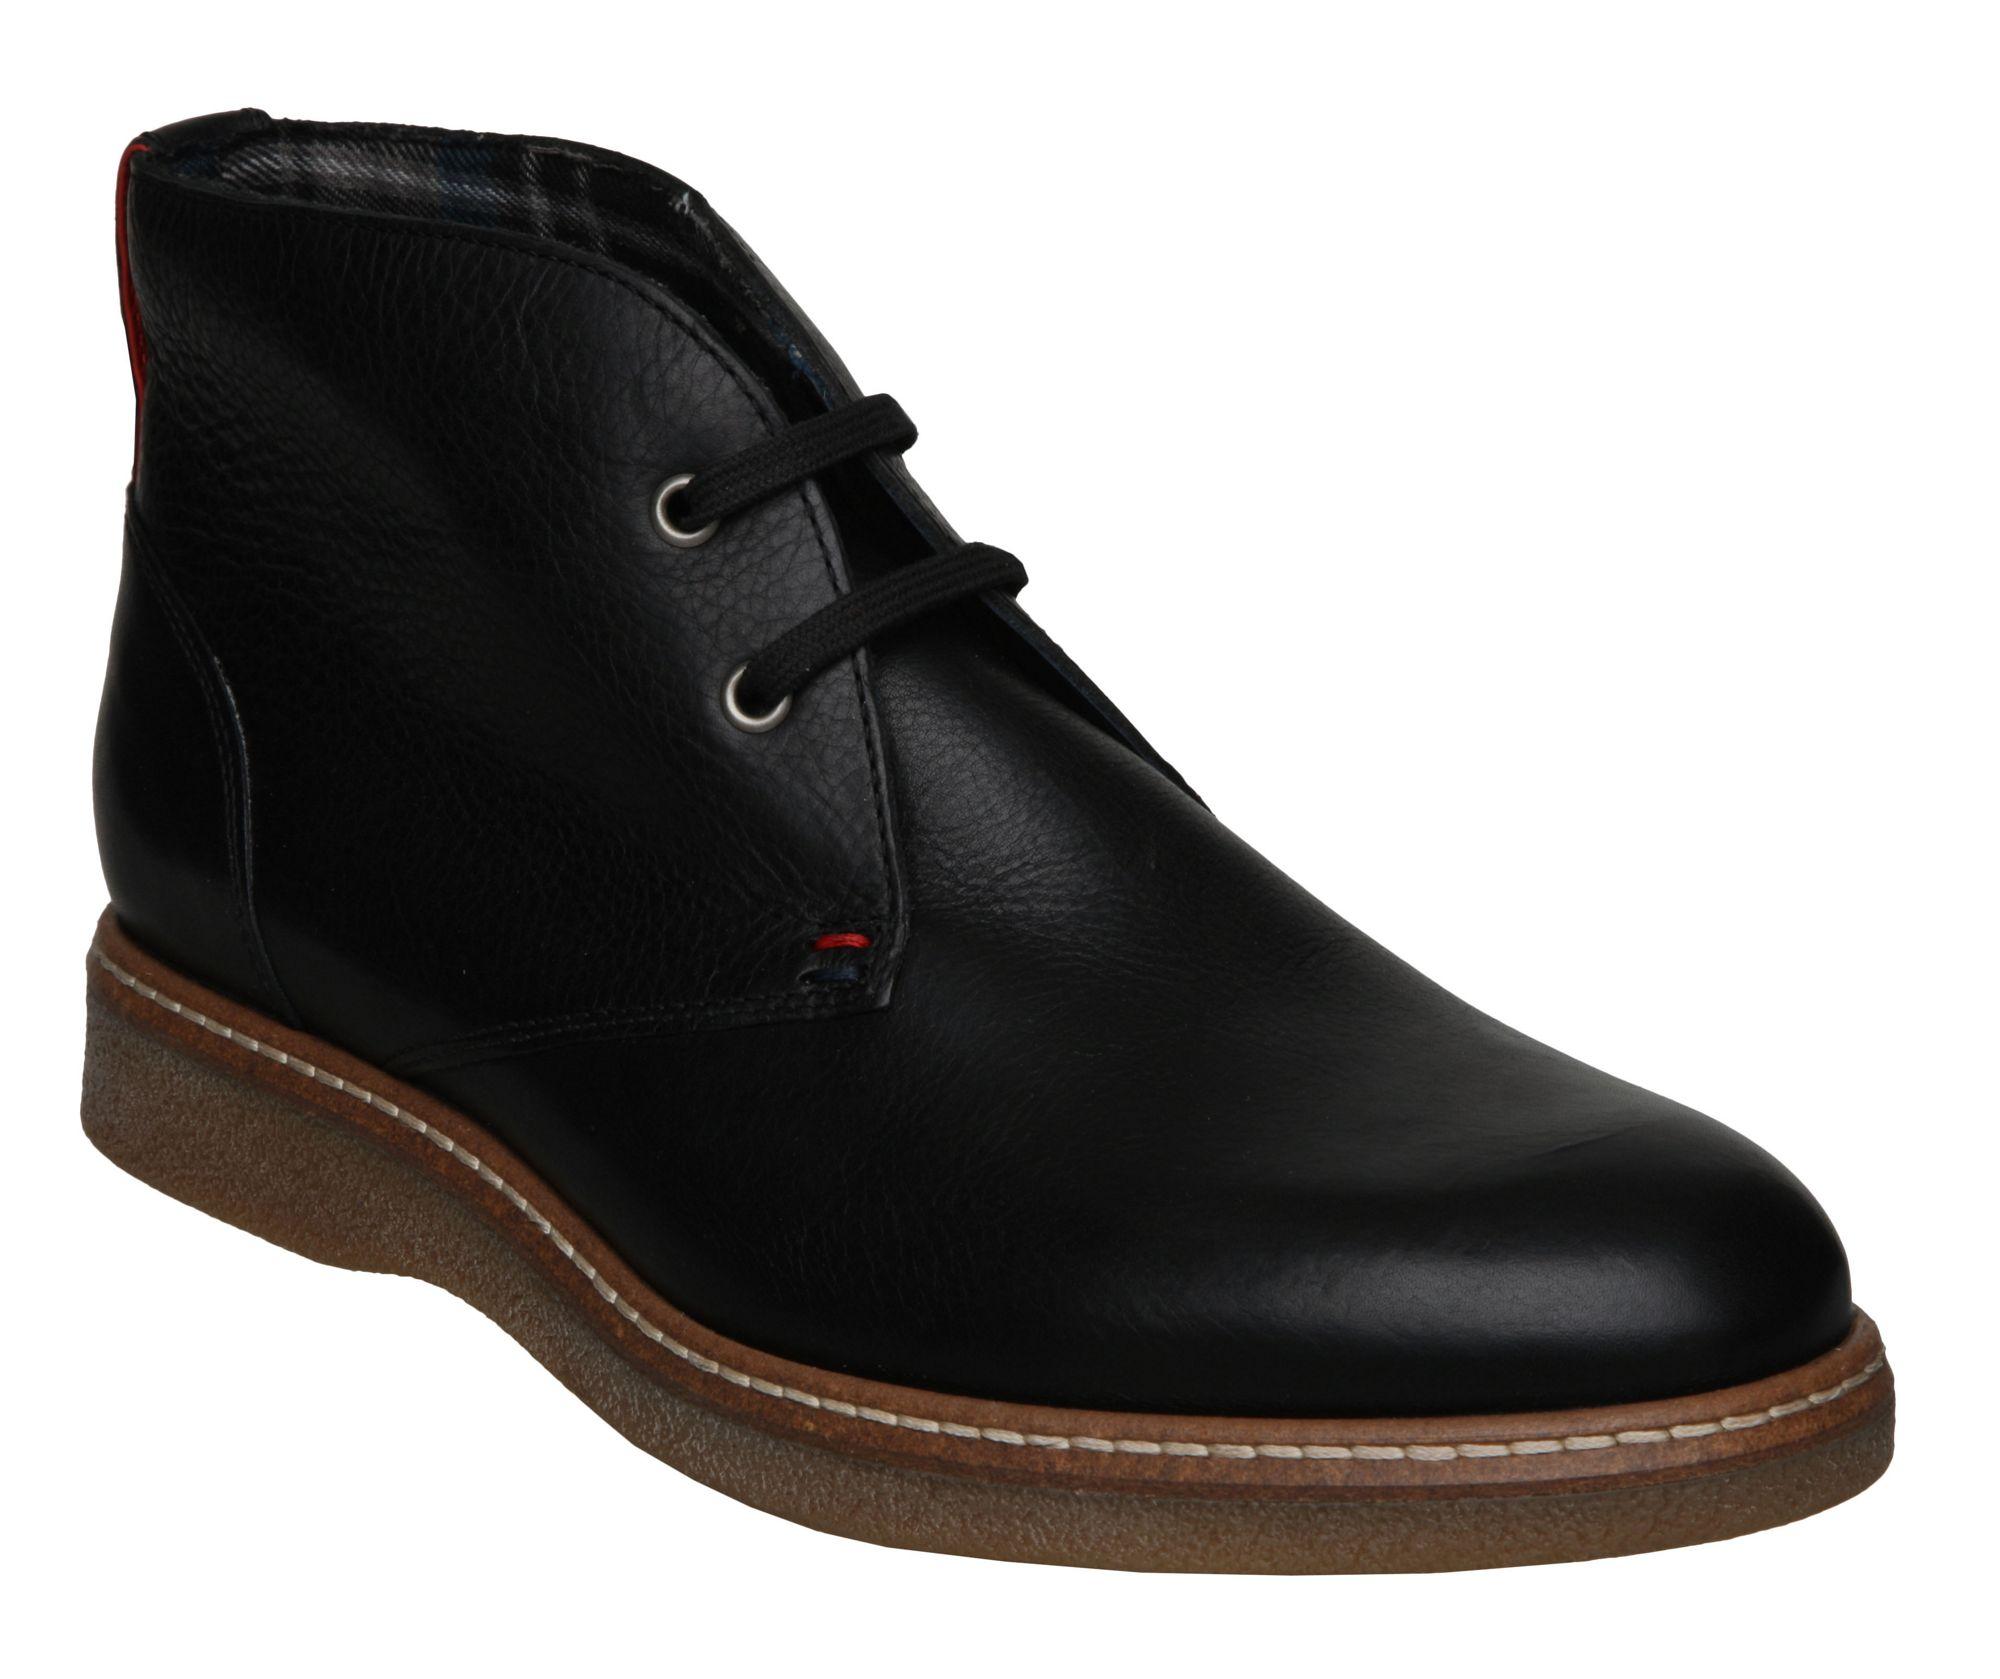 tommy hilfiger christopher 1a casual boots in black for men lyst. Black Bedroom Furniture Sets. Home Design Ideas